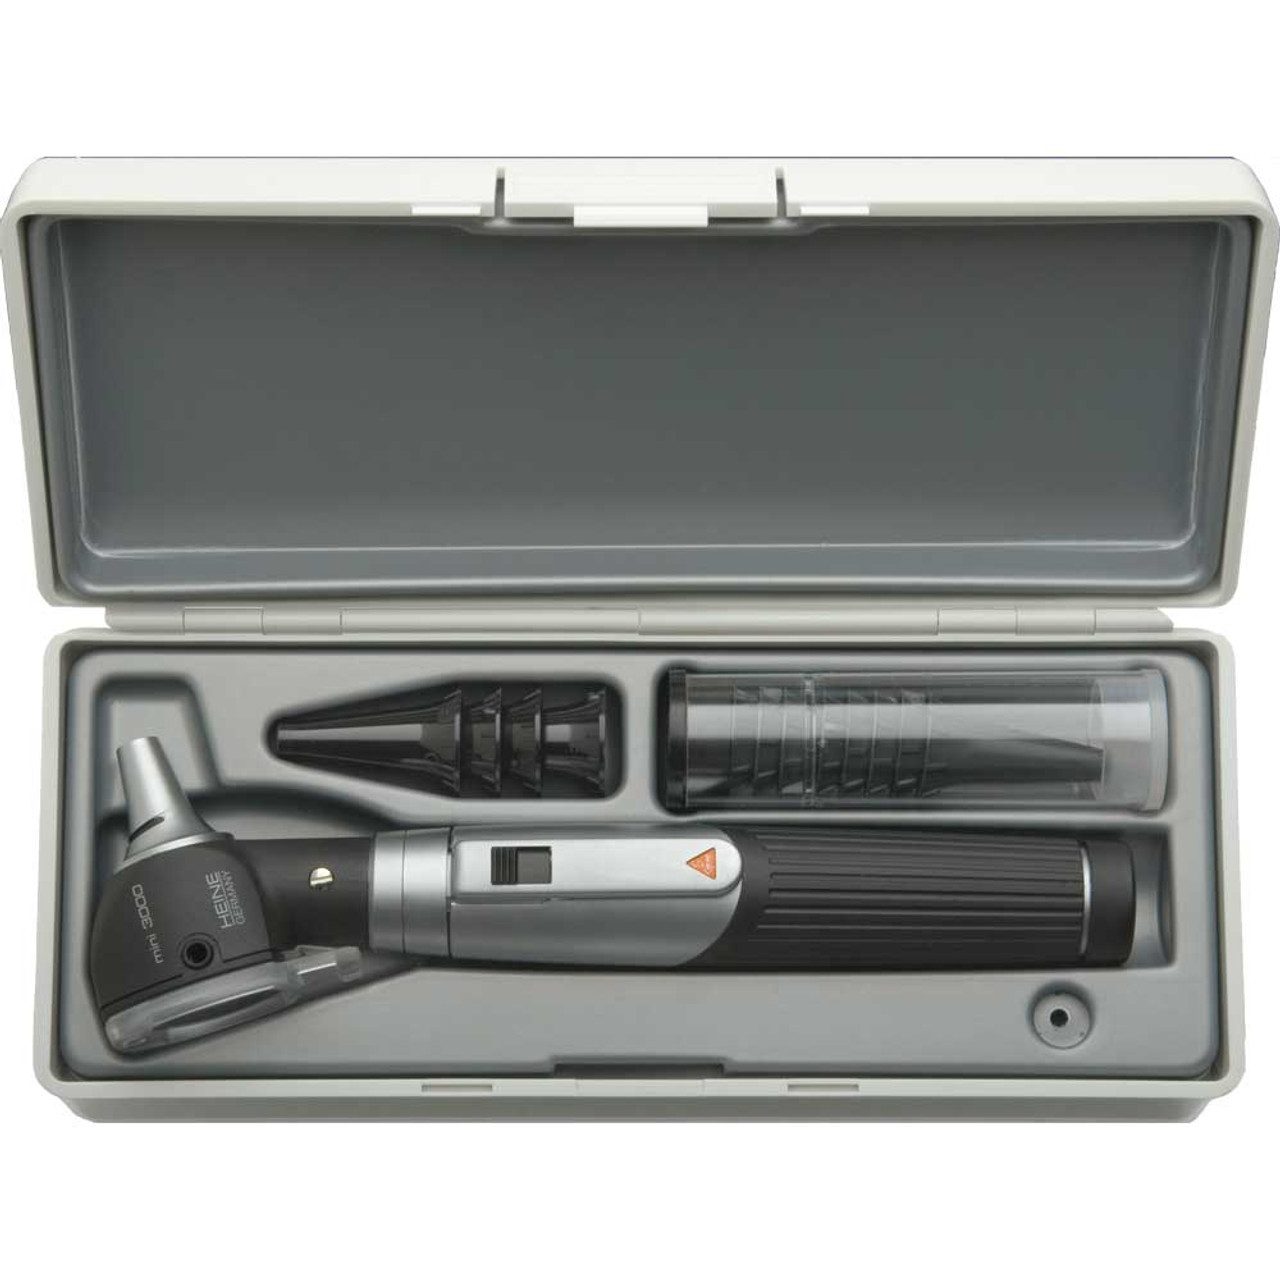 HEINE mini 3000 Otoscope Set (D-851.20.021)